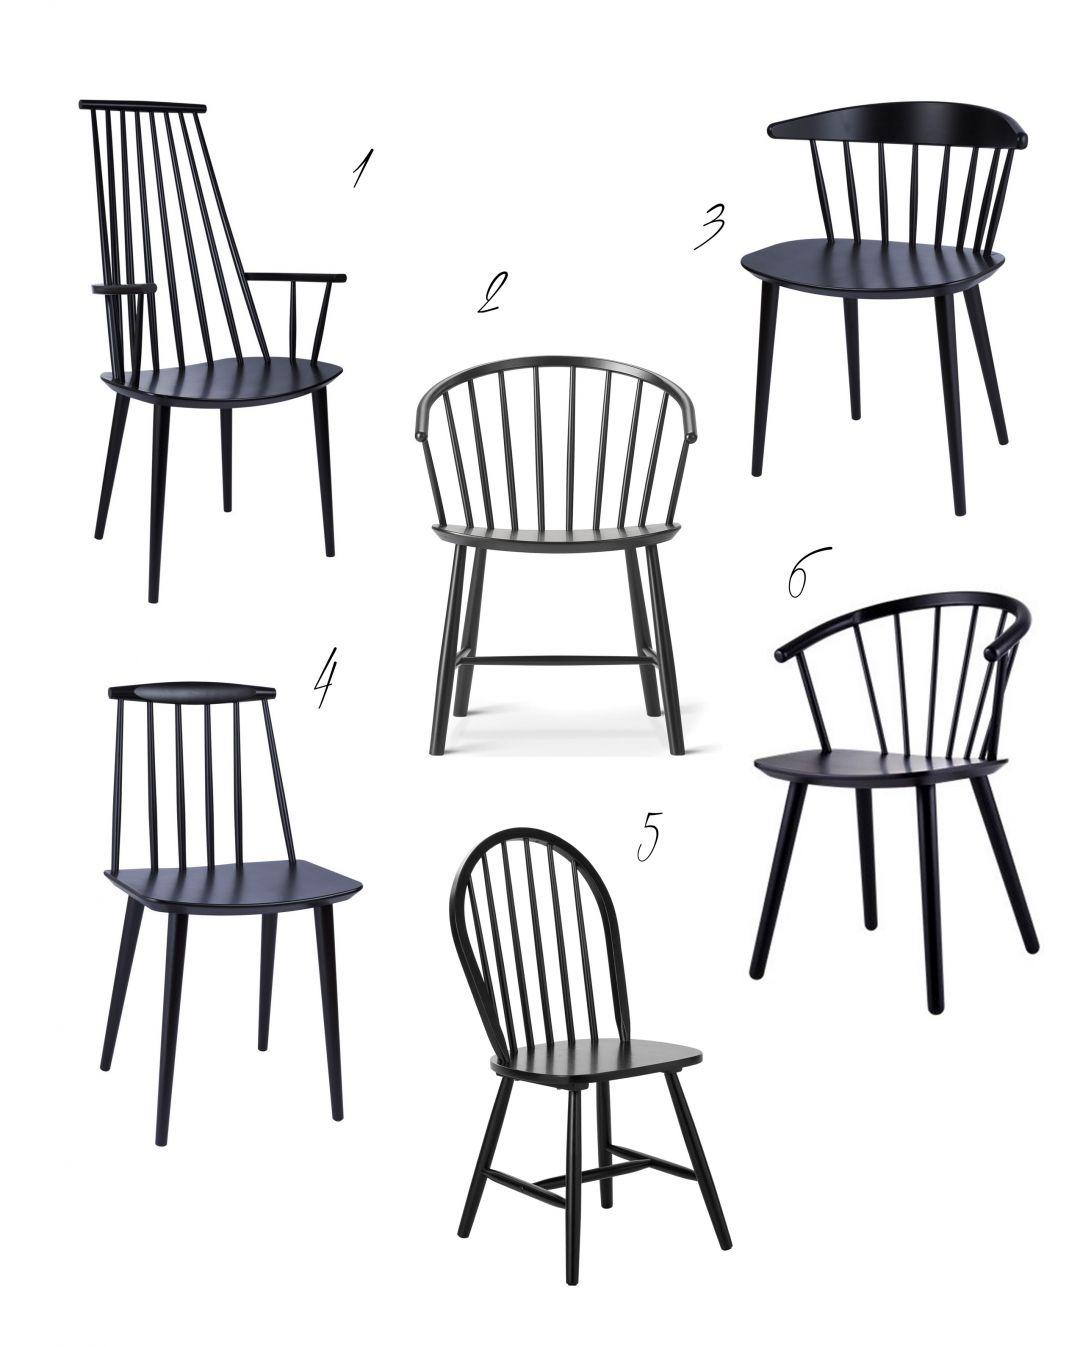 Schwarze Windsorstuhle Stabchen Stuhle Esszimmerstuhl Stuhle Esstisch Stuhle